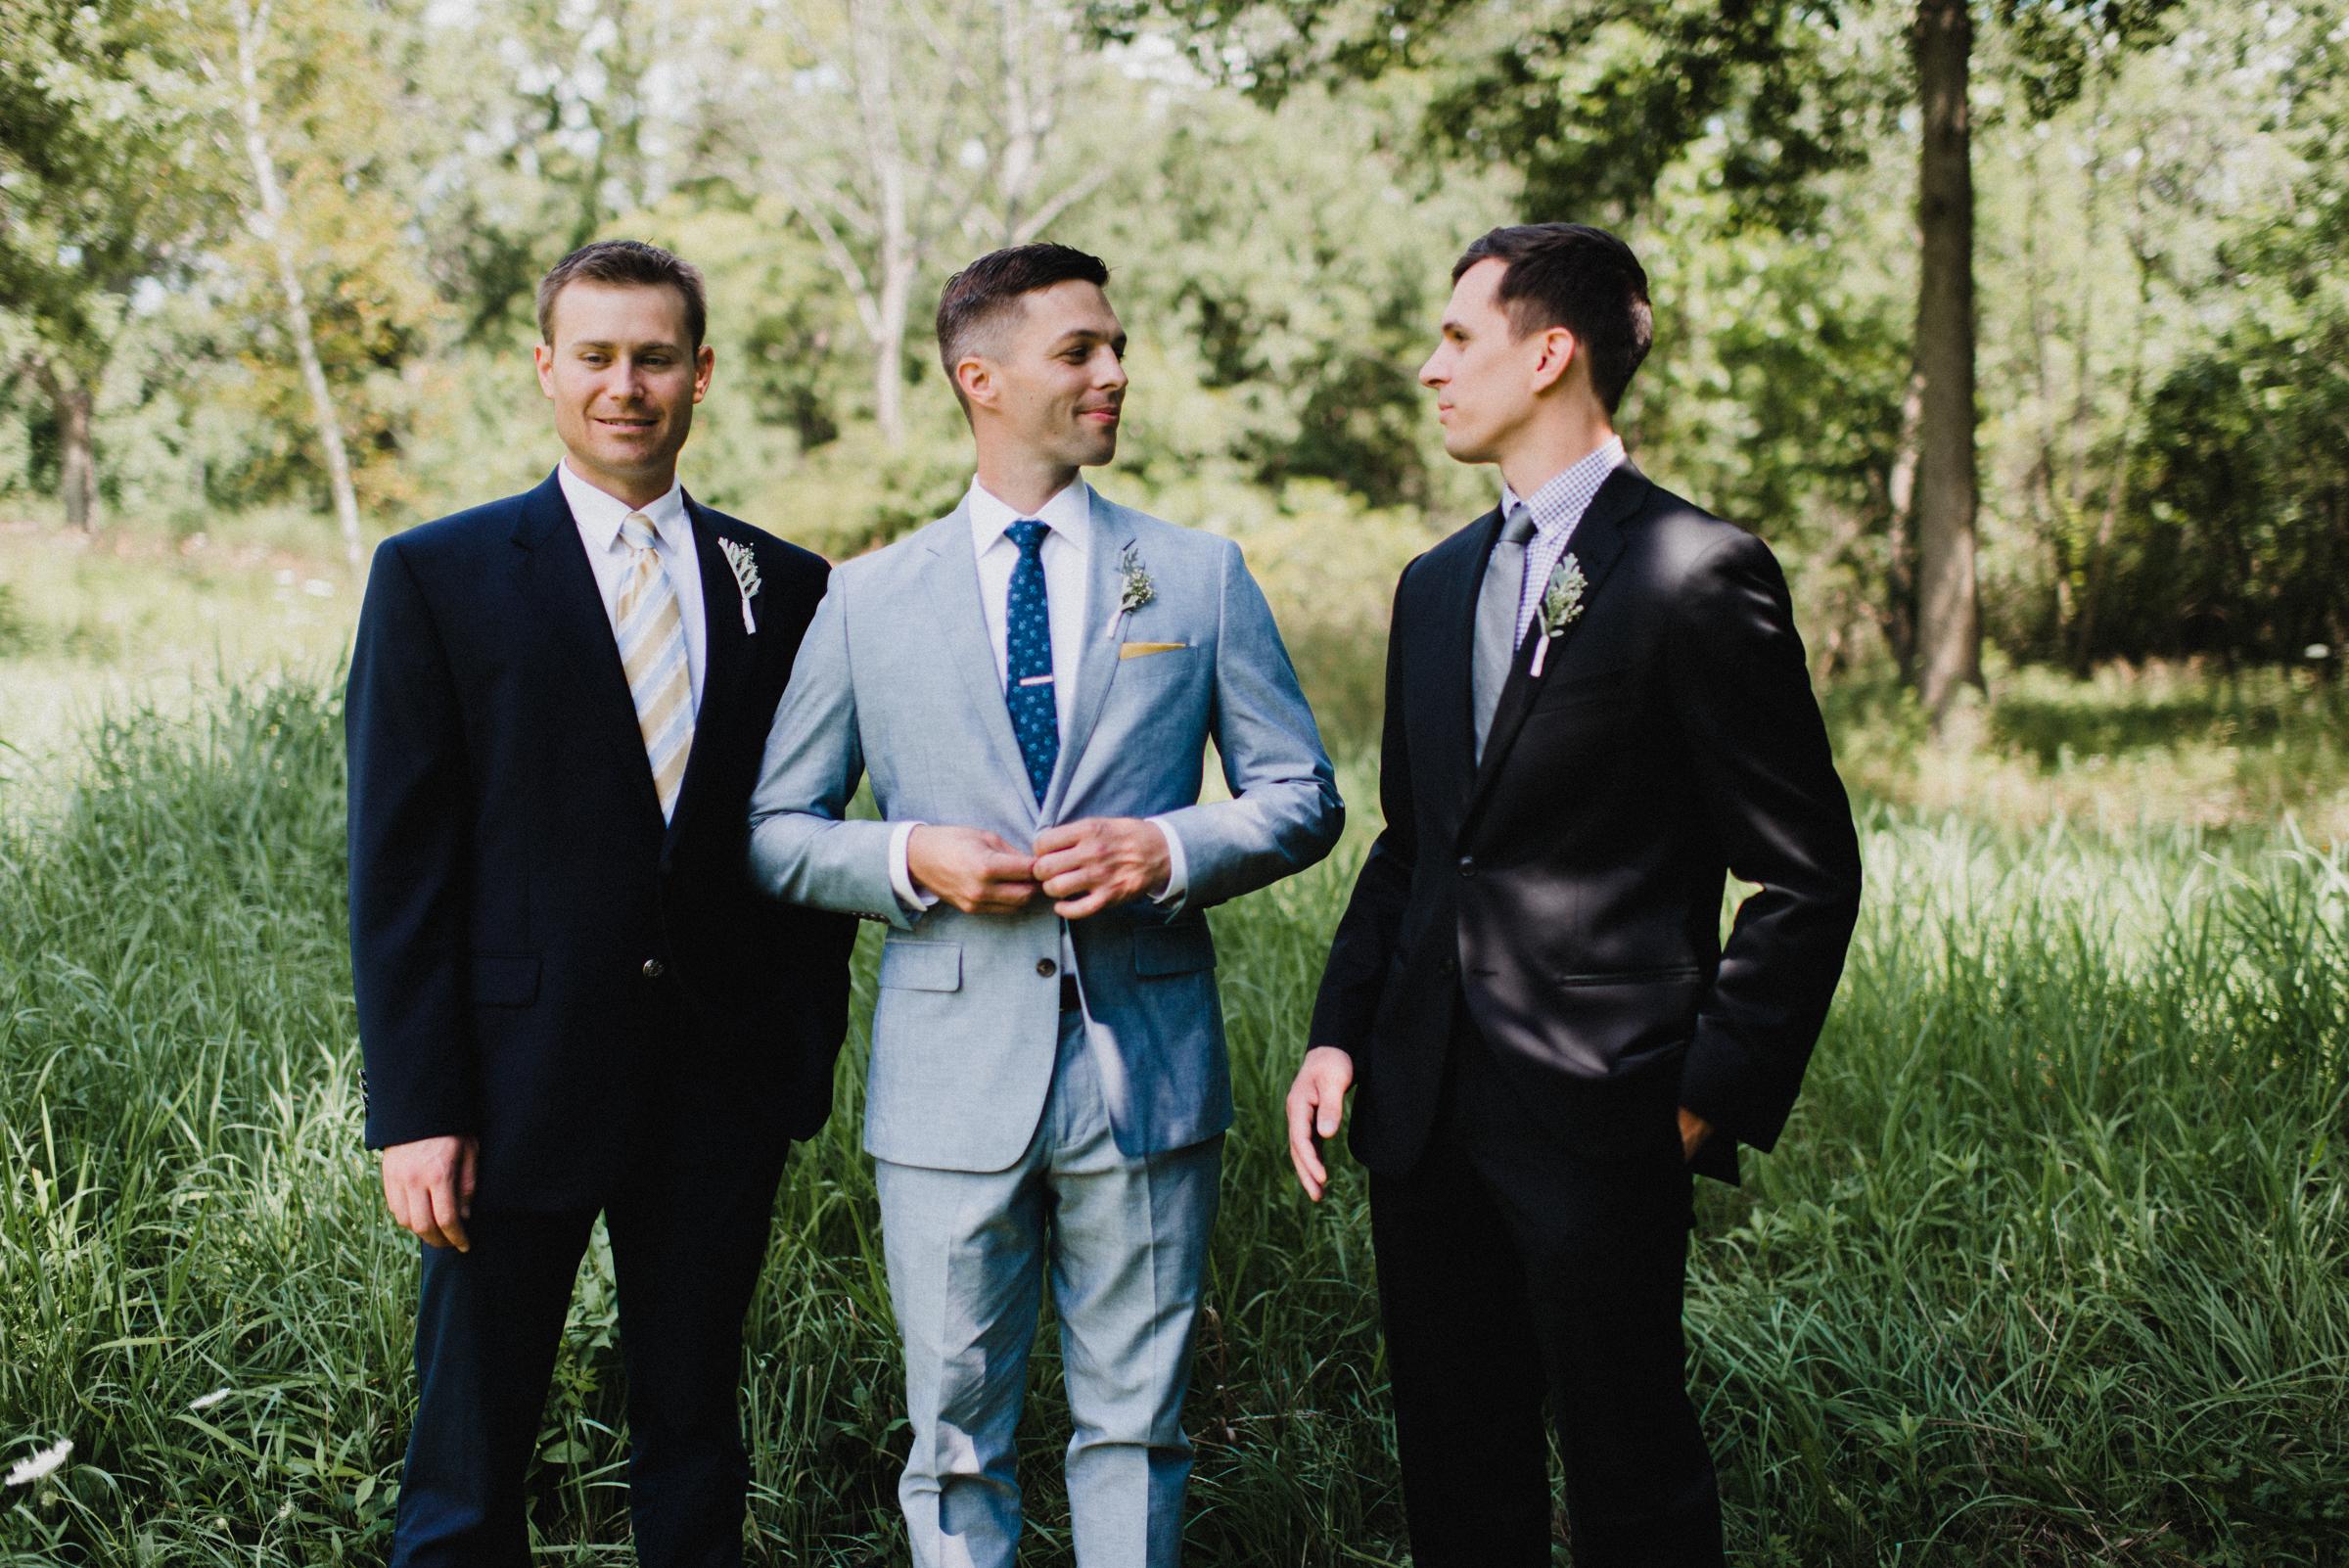 Intimate-Backyard-Farmhouse-Ohio-Wedding-Andi+Ben_Mallory+Justin-Photographers-115.JPG